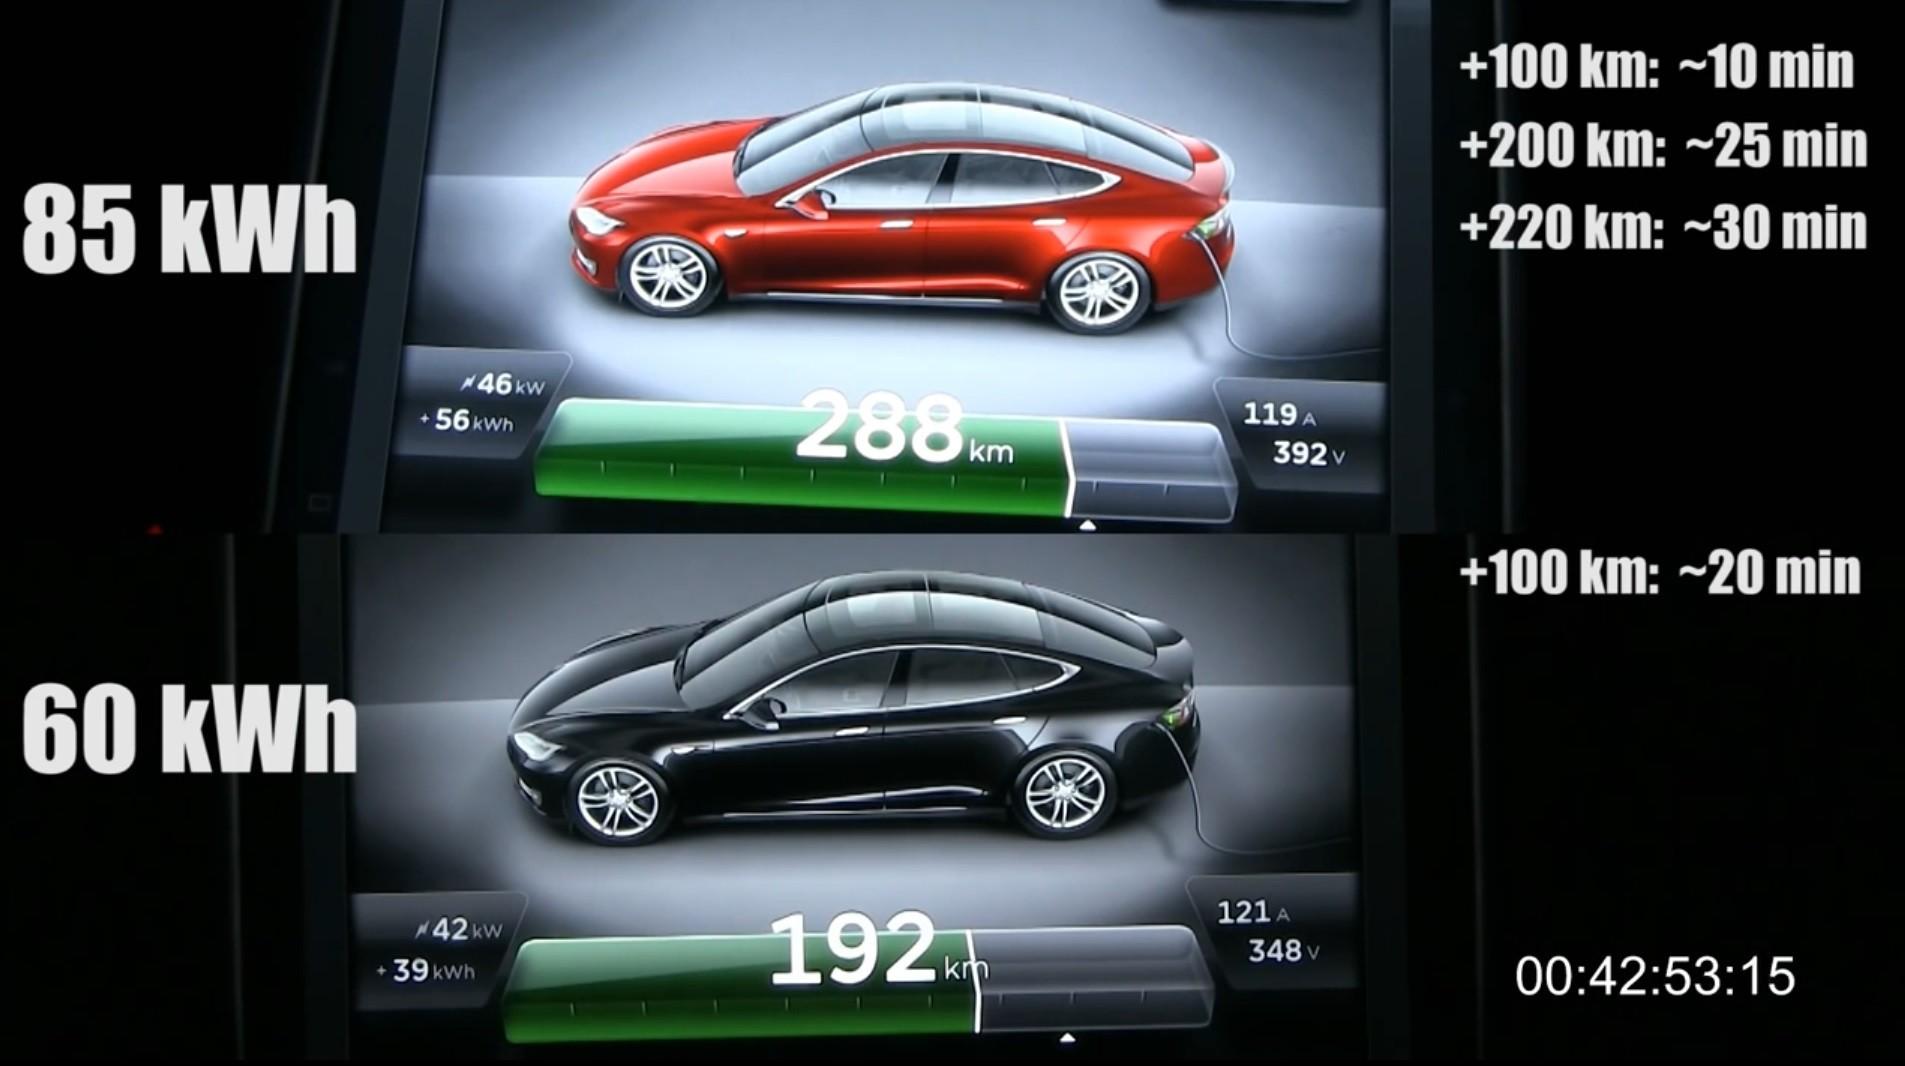 Tesla Model S Engine Diagram Parison Image My Related Post